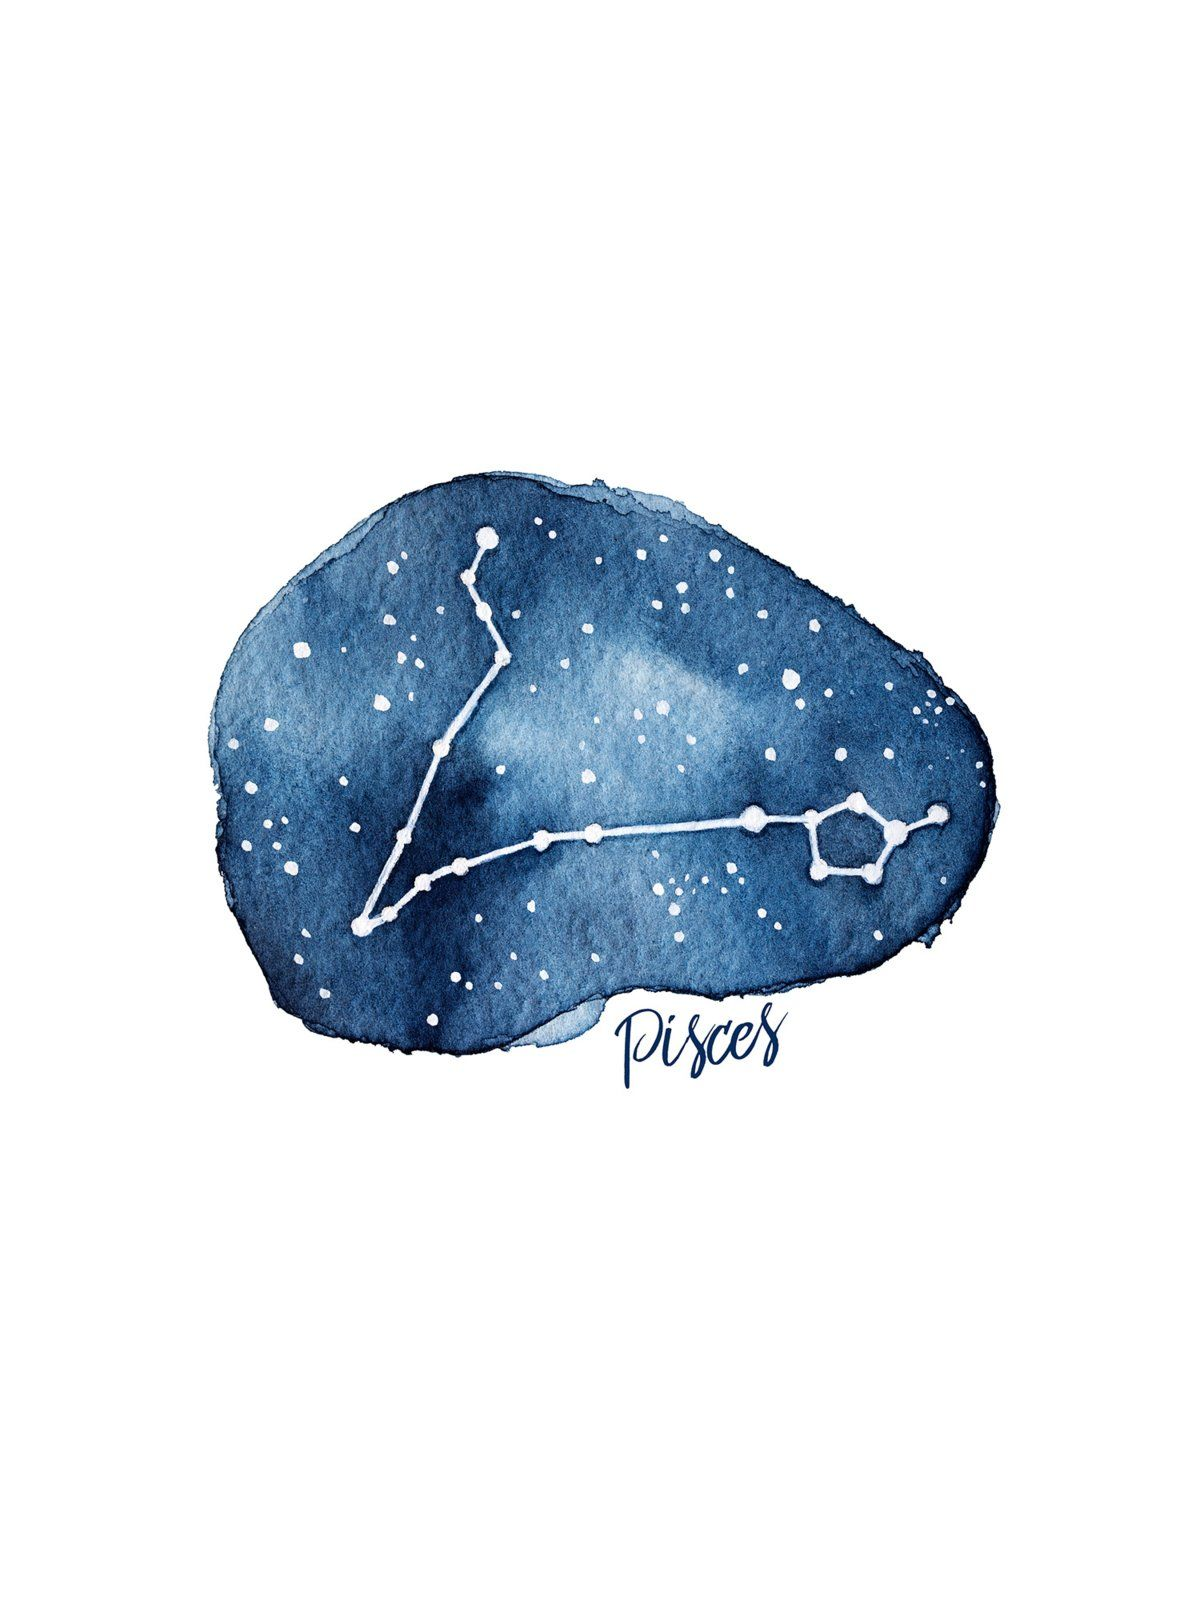 Horoskop für partnersuche